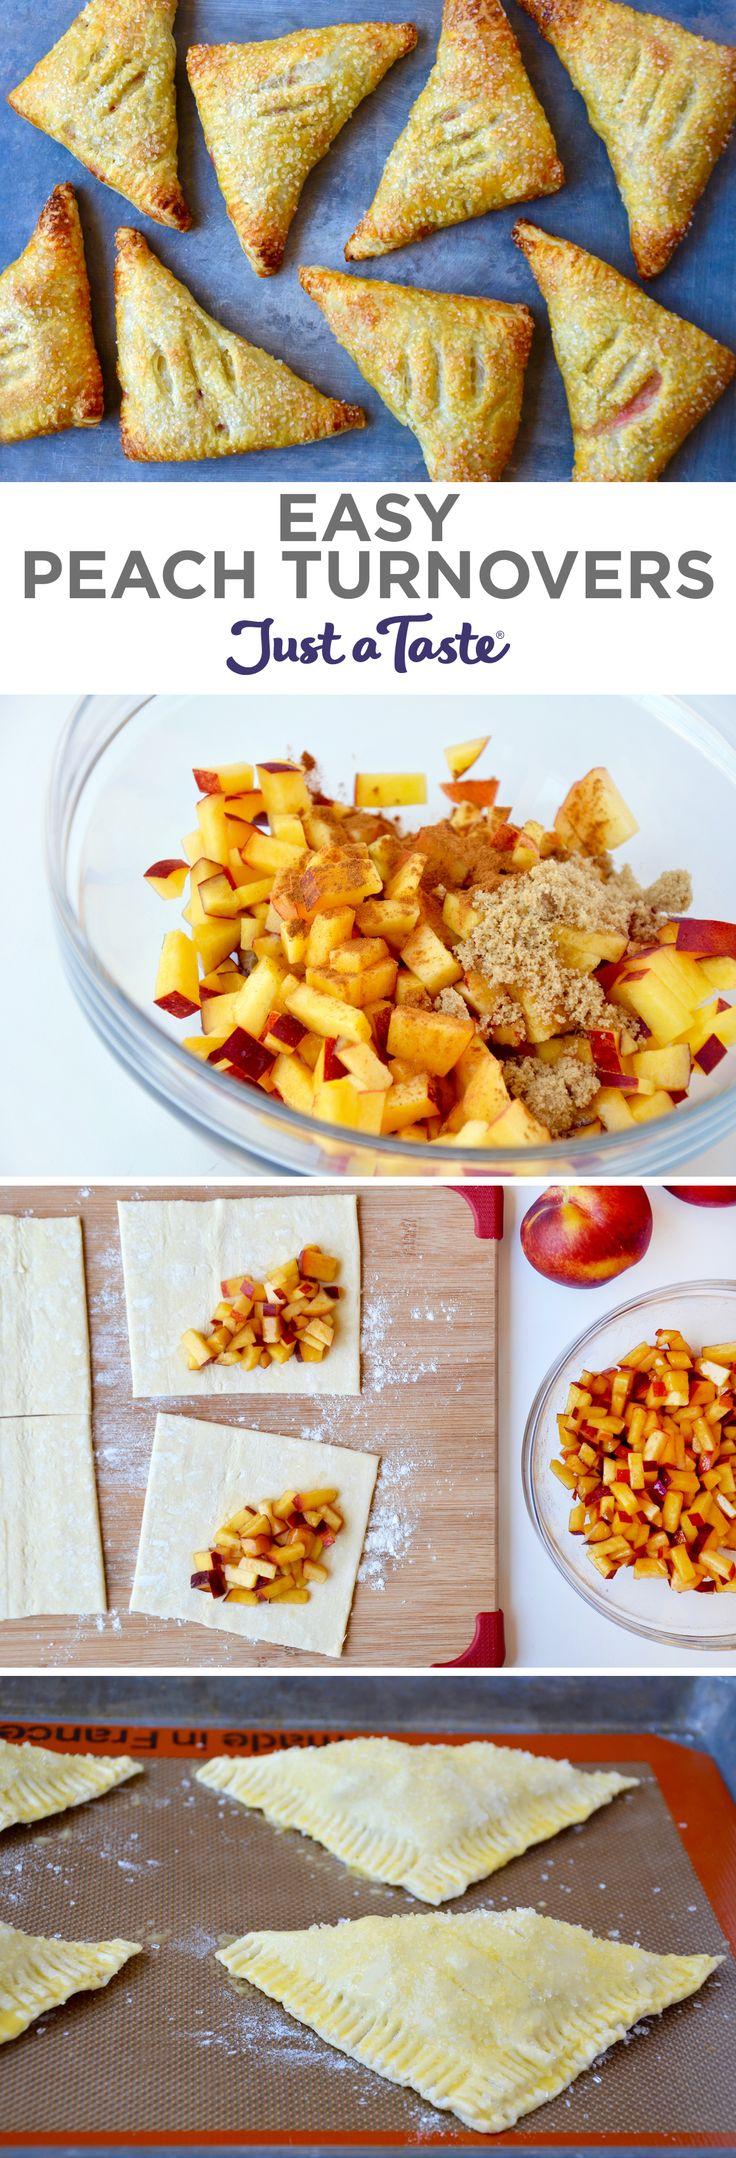 Easy Peach Turnovers | #recipe via justataste.com